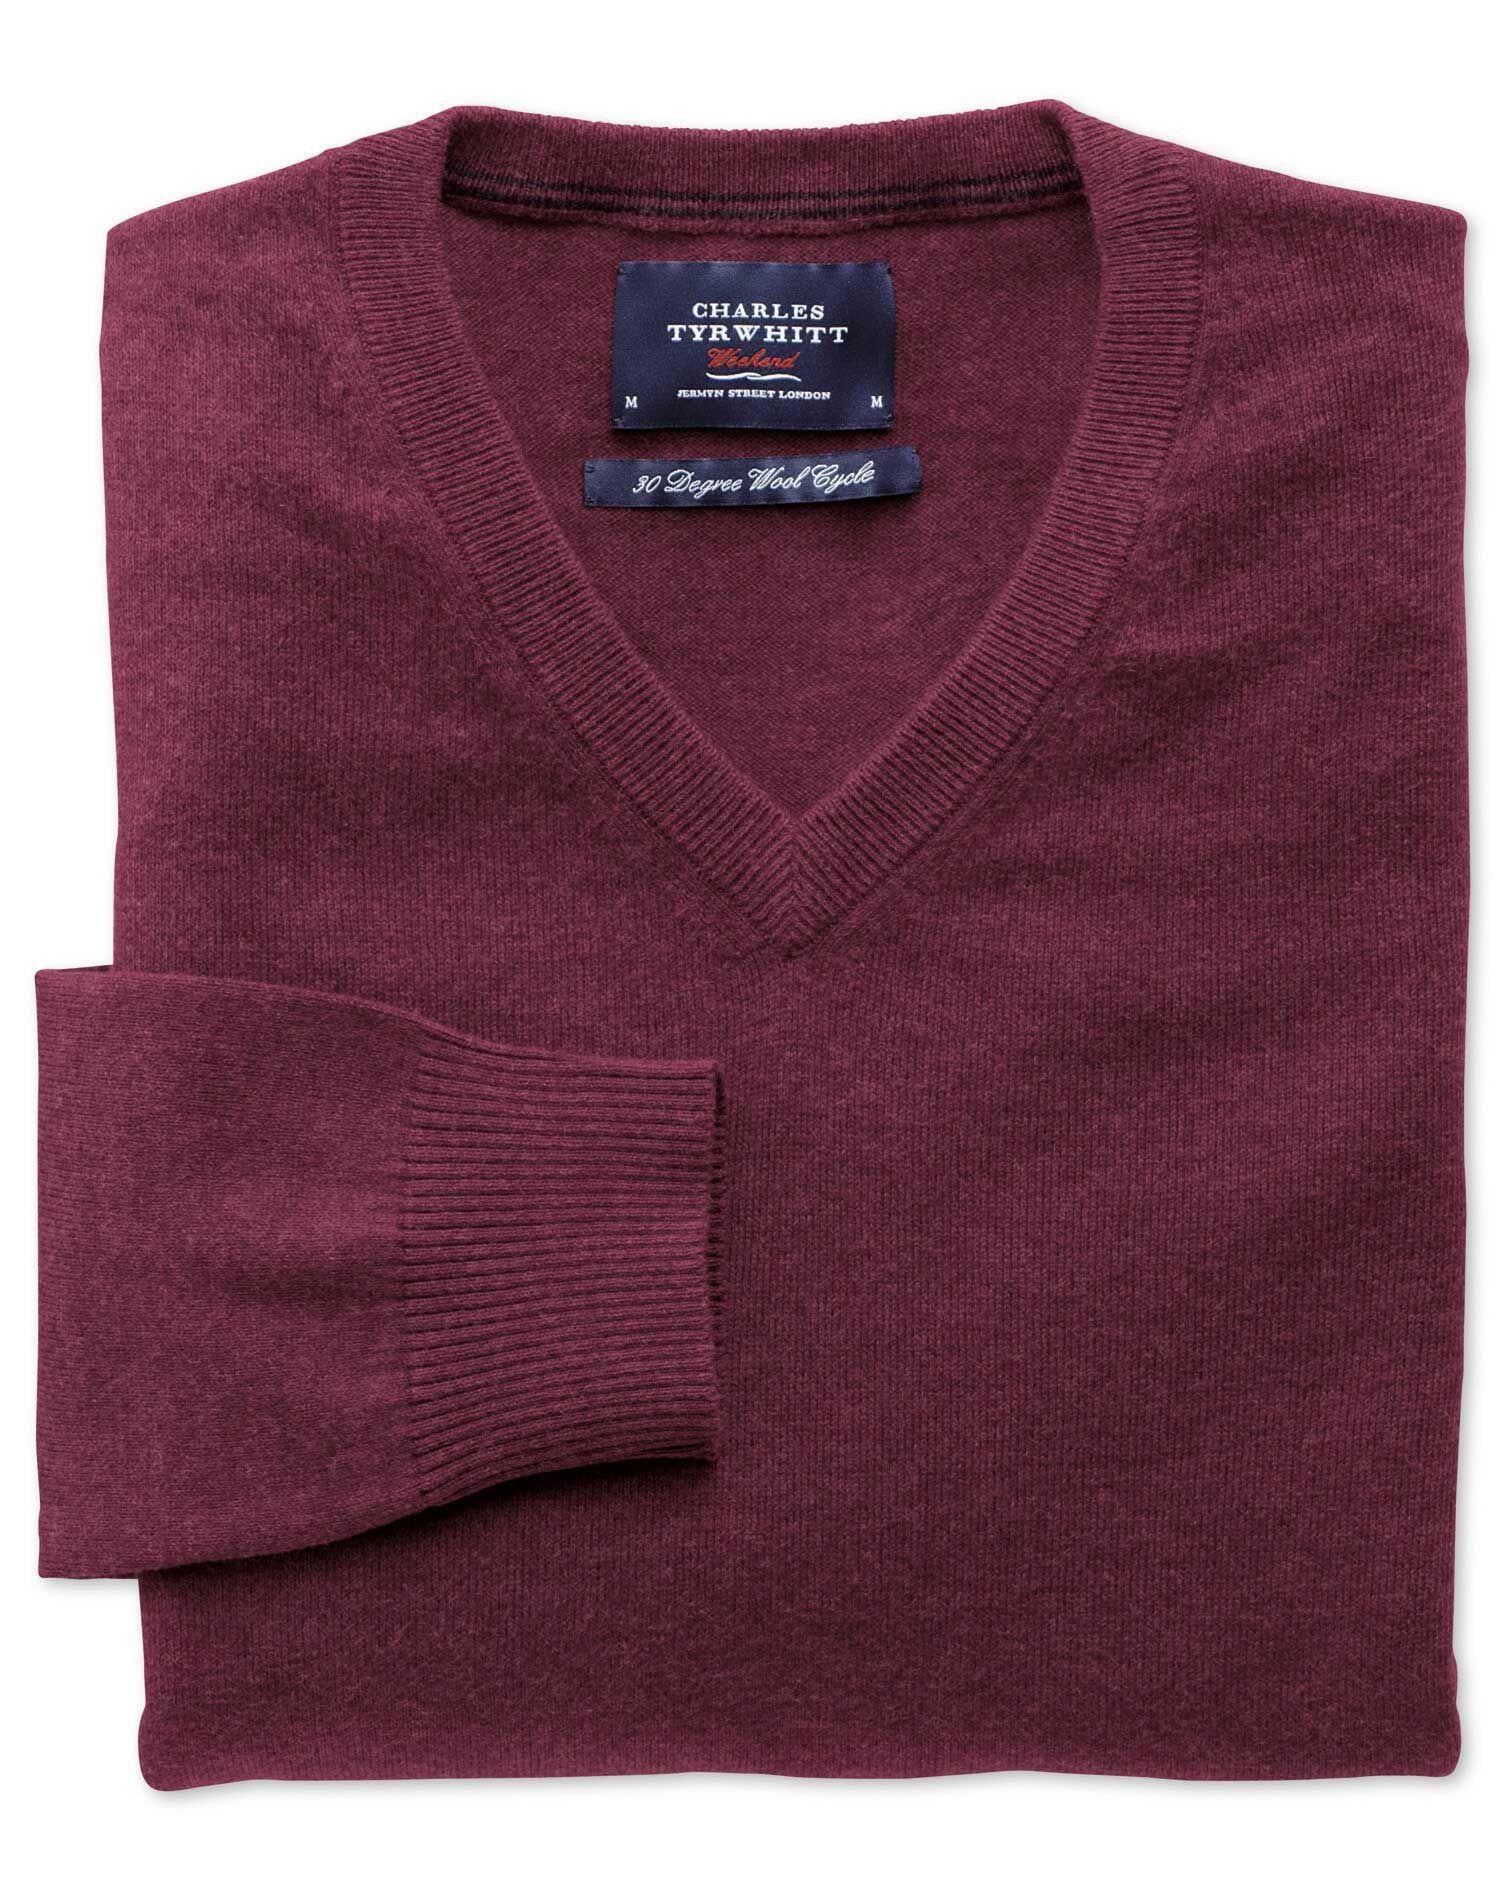 Wine Cotton Cashmere V-Neck Jumper Size XS by Charles Tyrwhitt